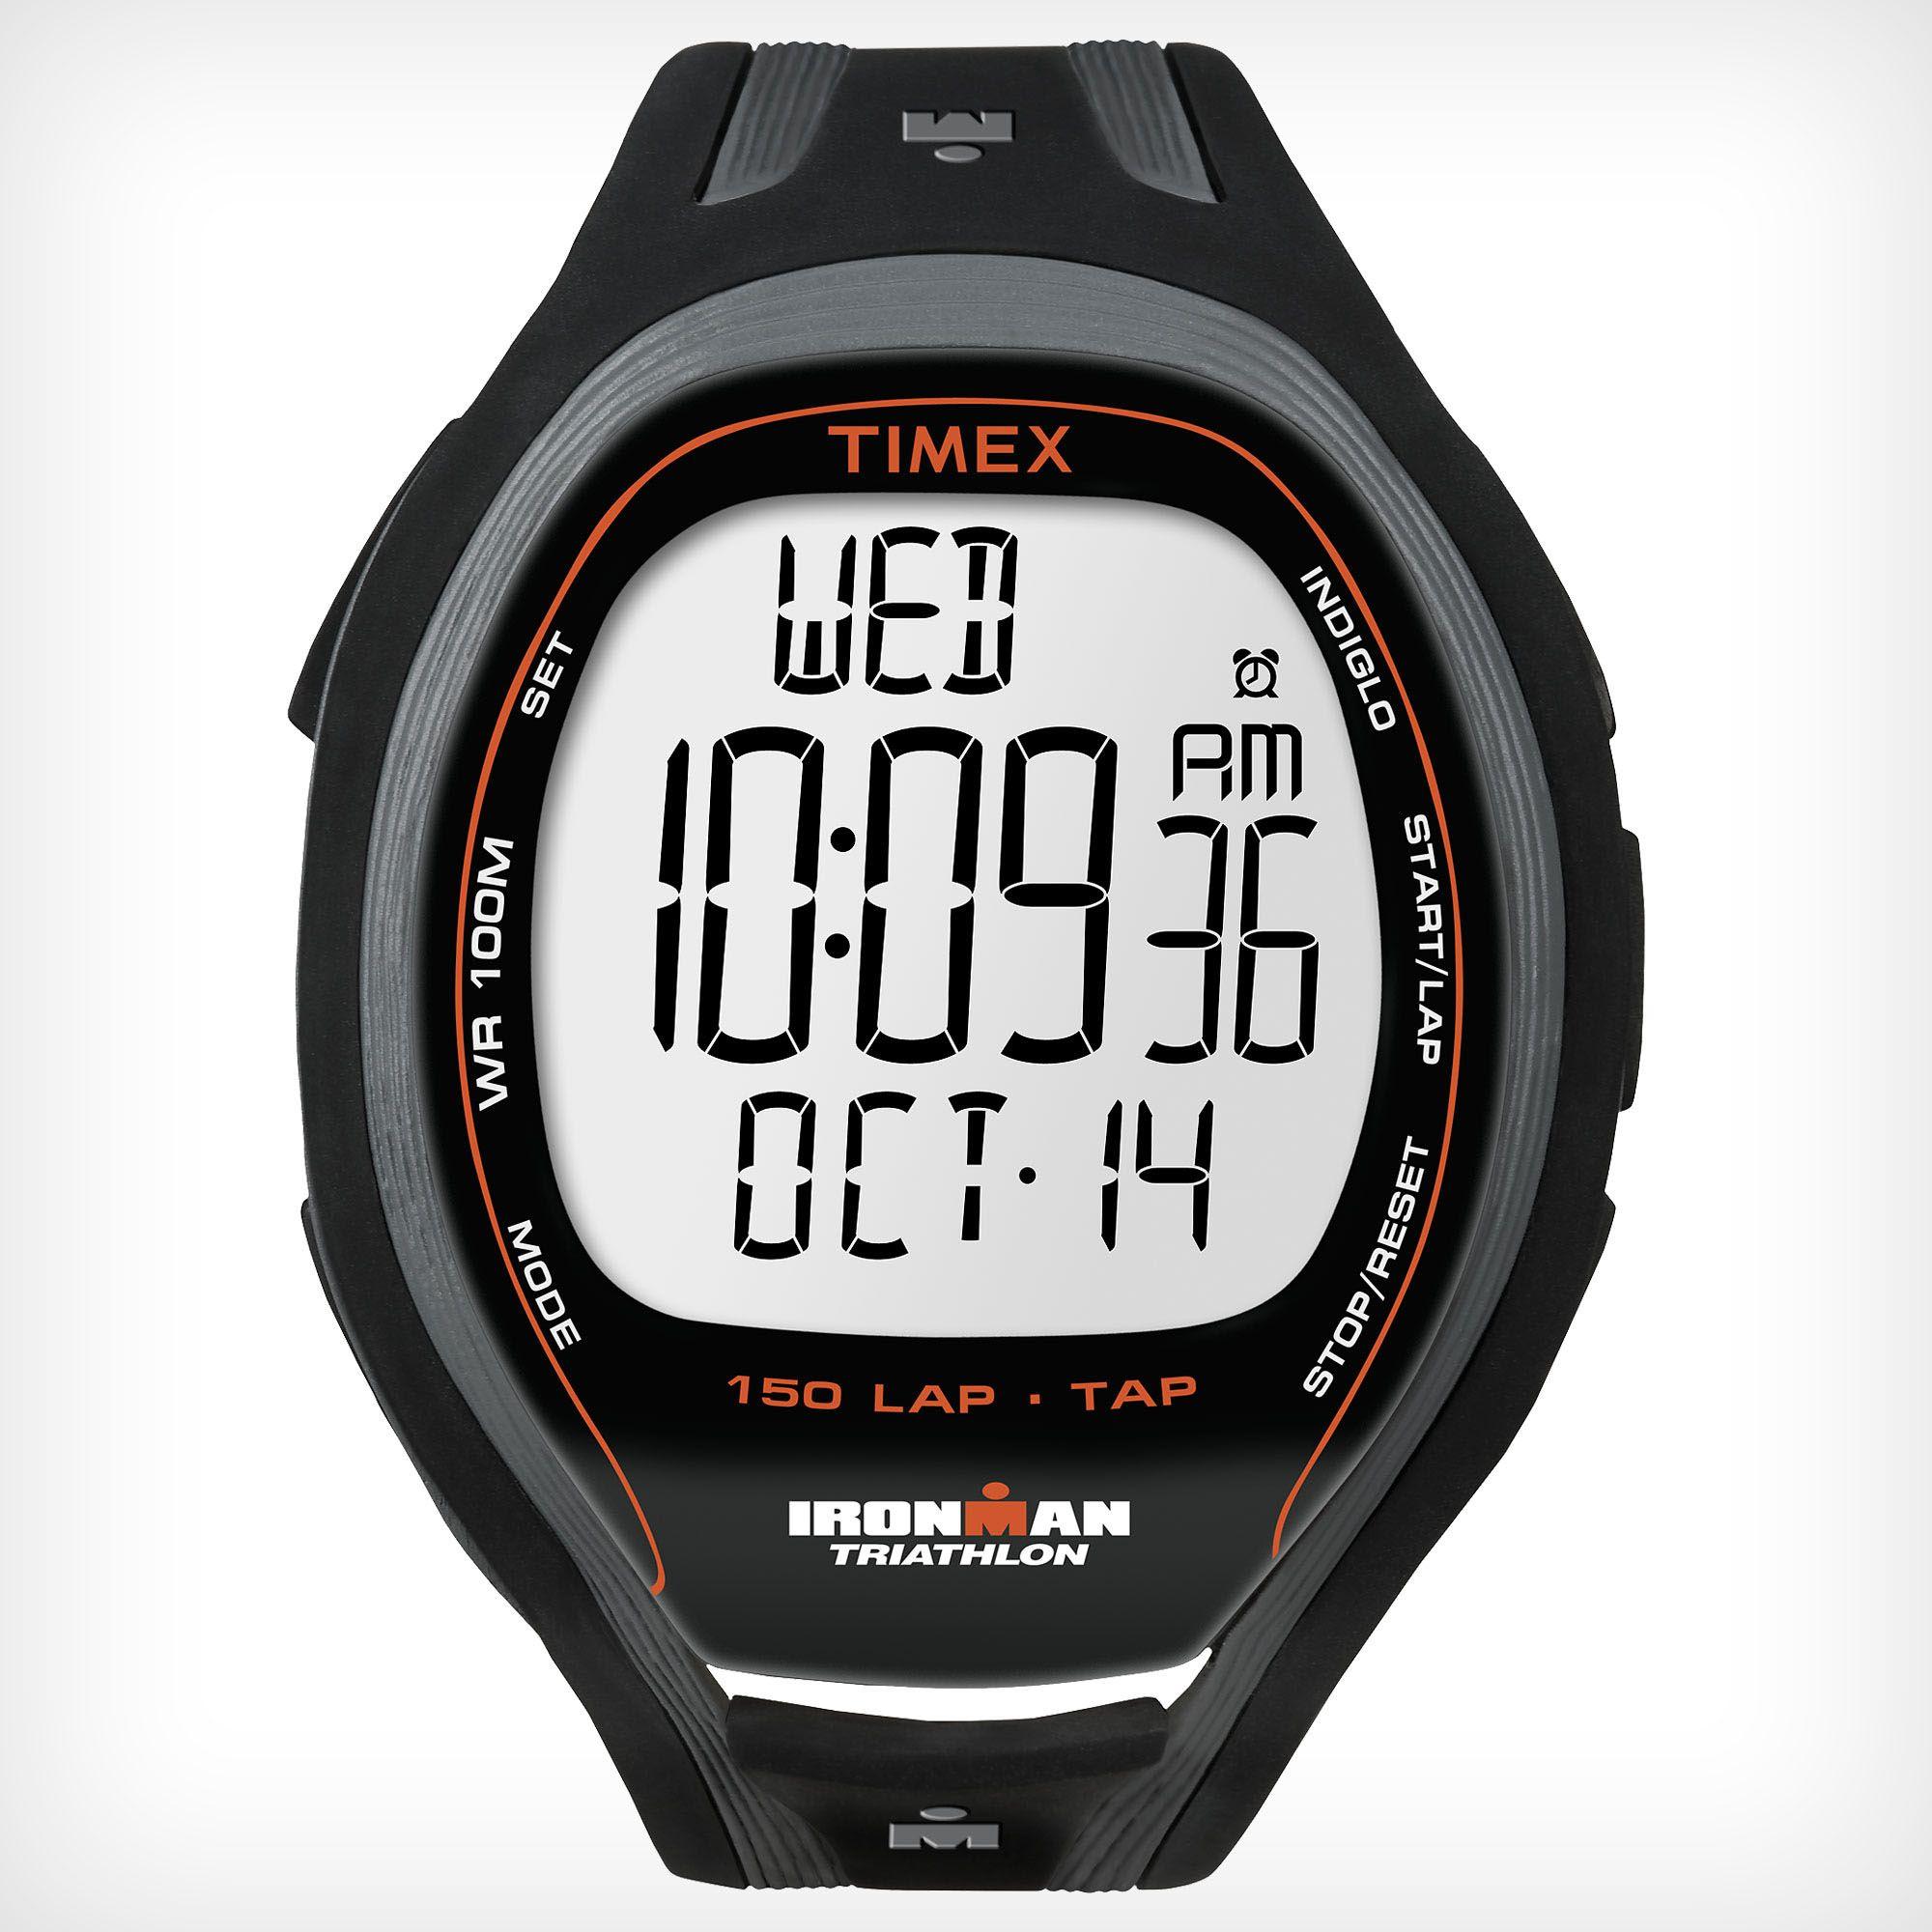 Timex T5K253 Mens Ironman TAP Sleek 150 Lap Watch